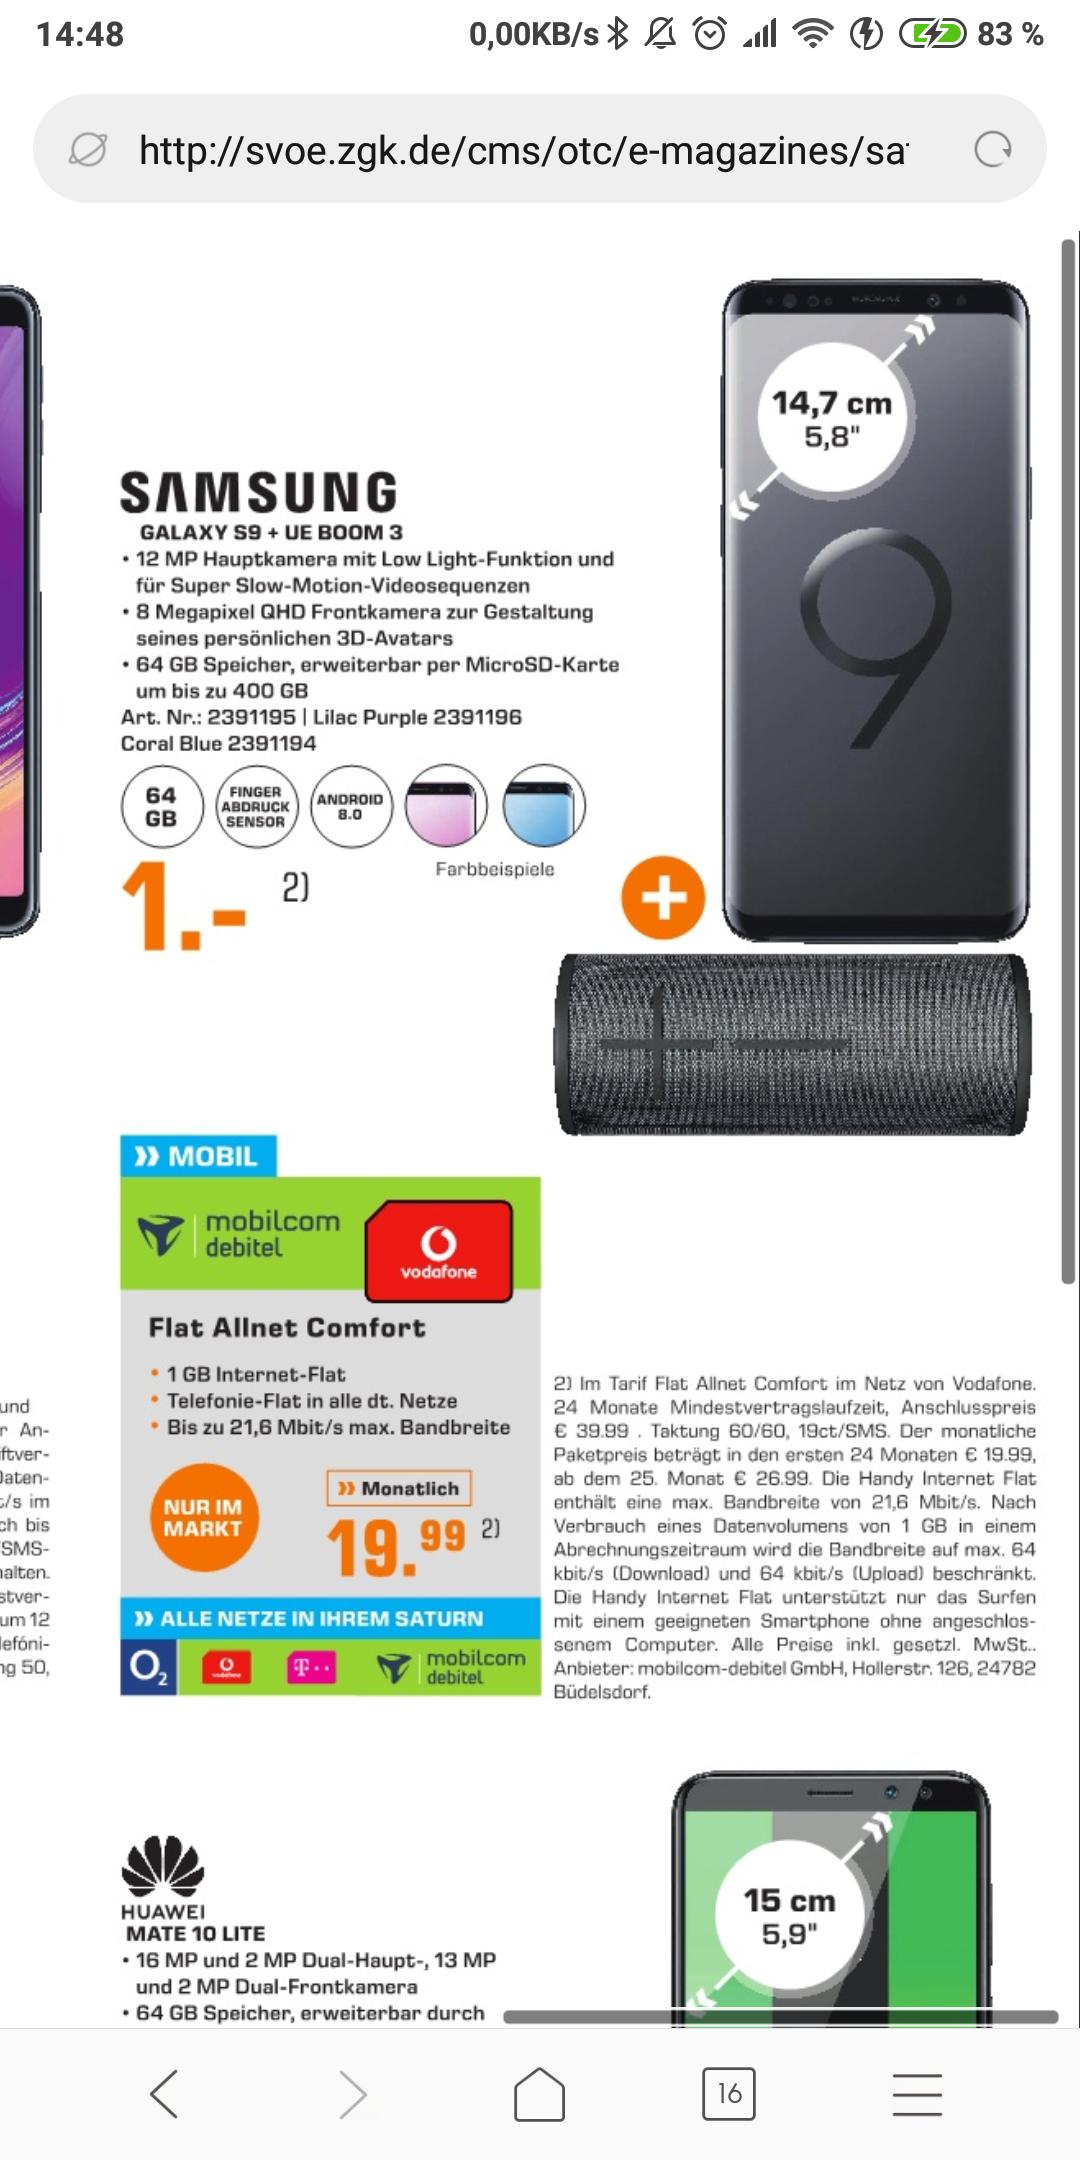 [local Köln] debitel vodafone  1GB + Samsung s9 + UE Boom 3 effektiv -29,17€